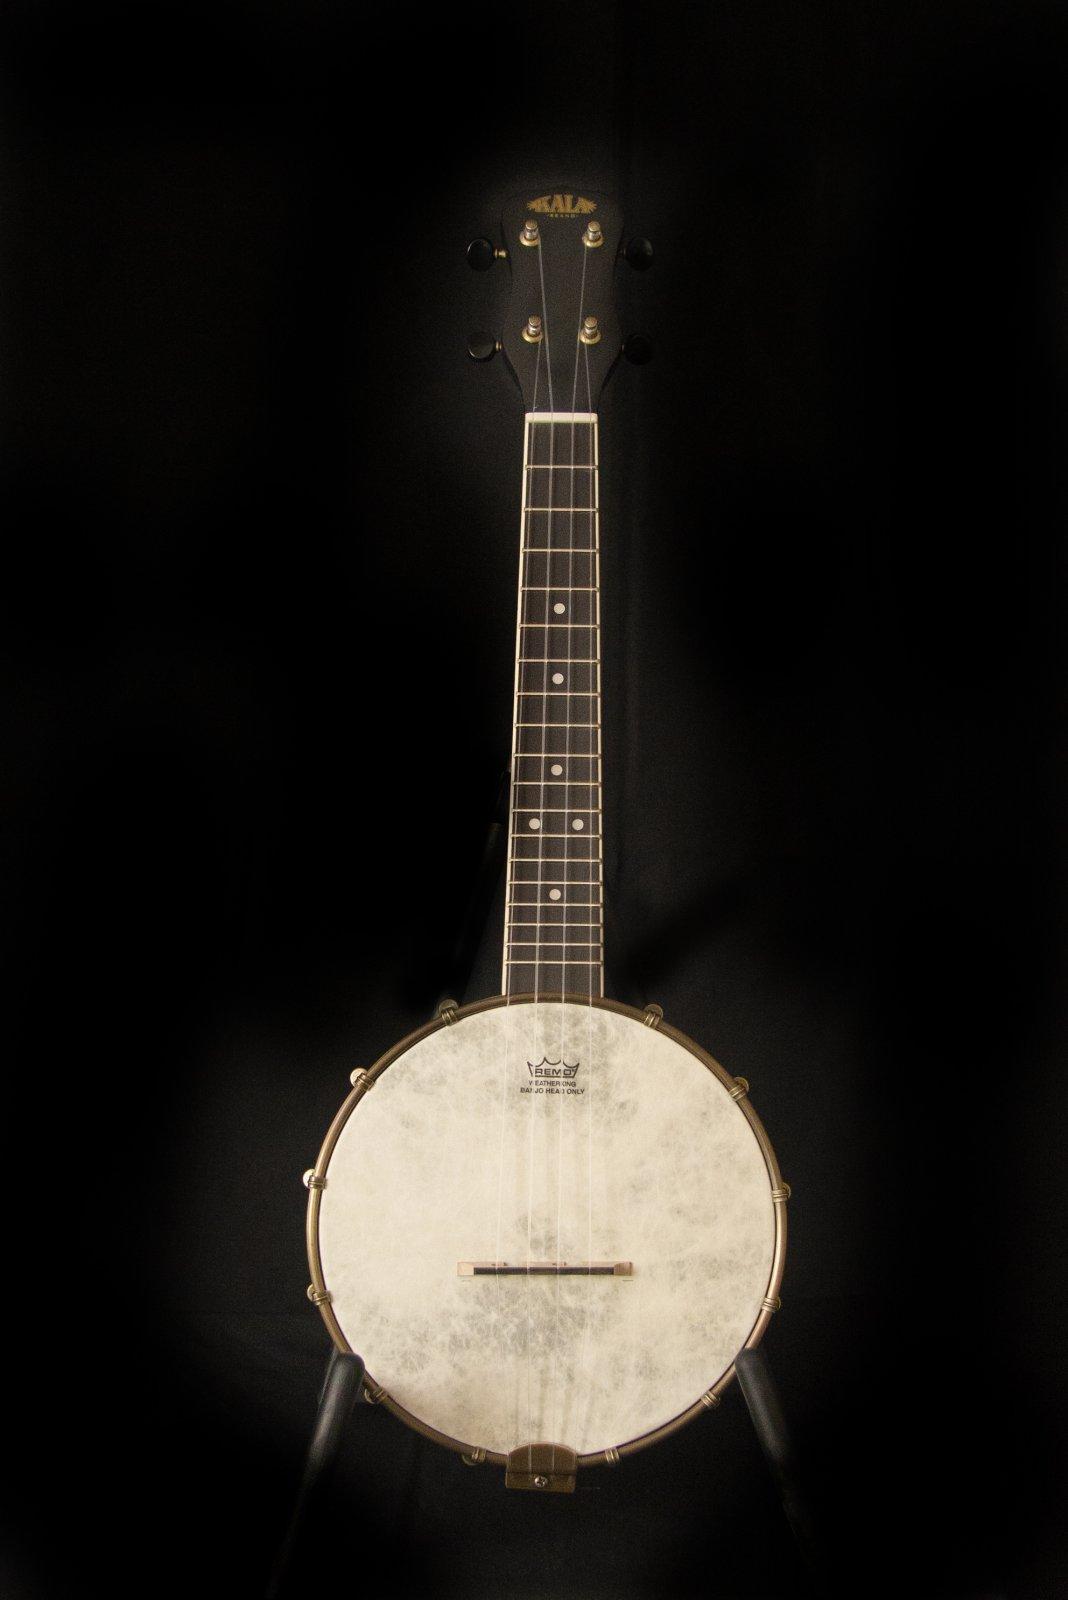 Kala Concert Banjo Ukulele, Black